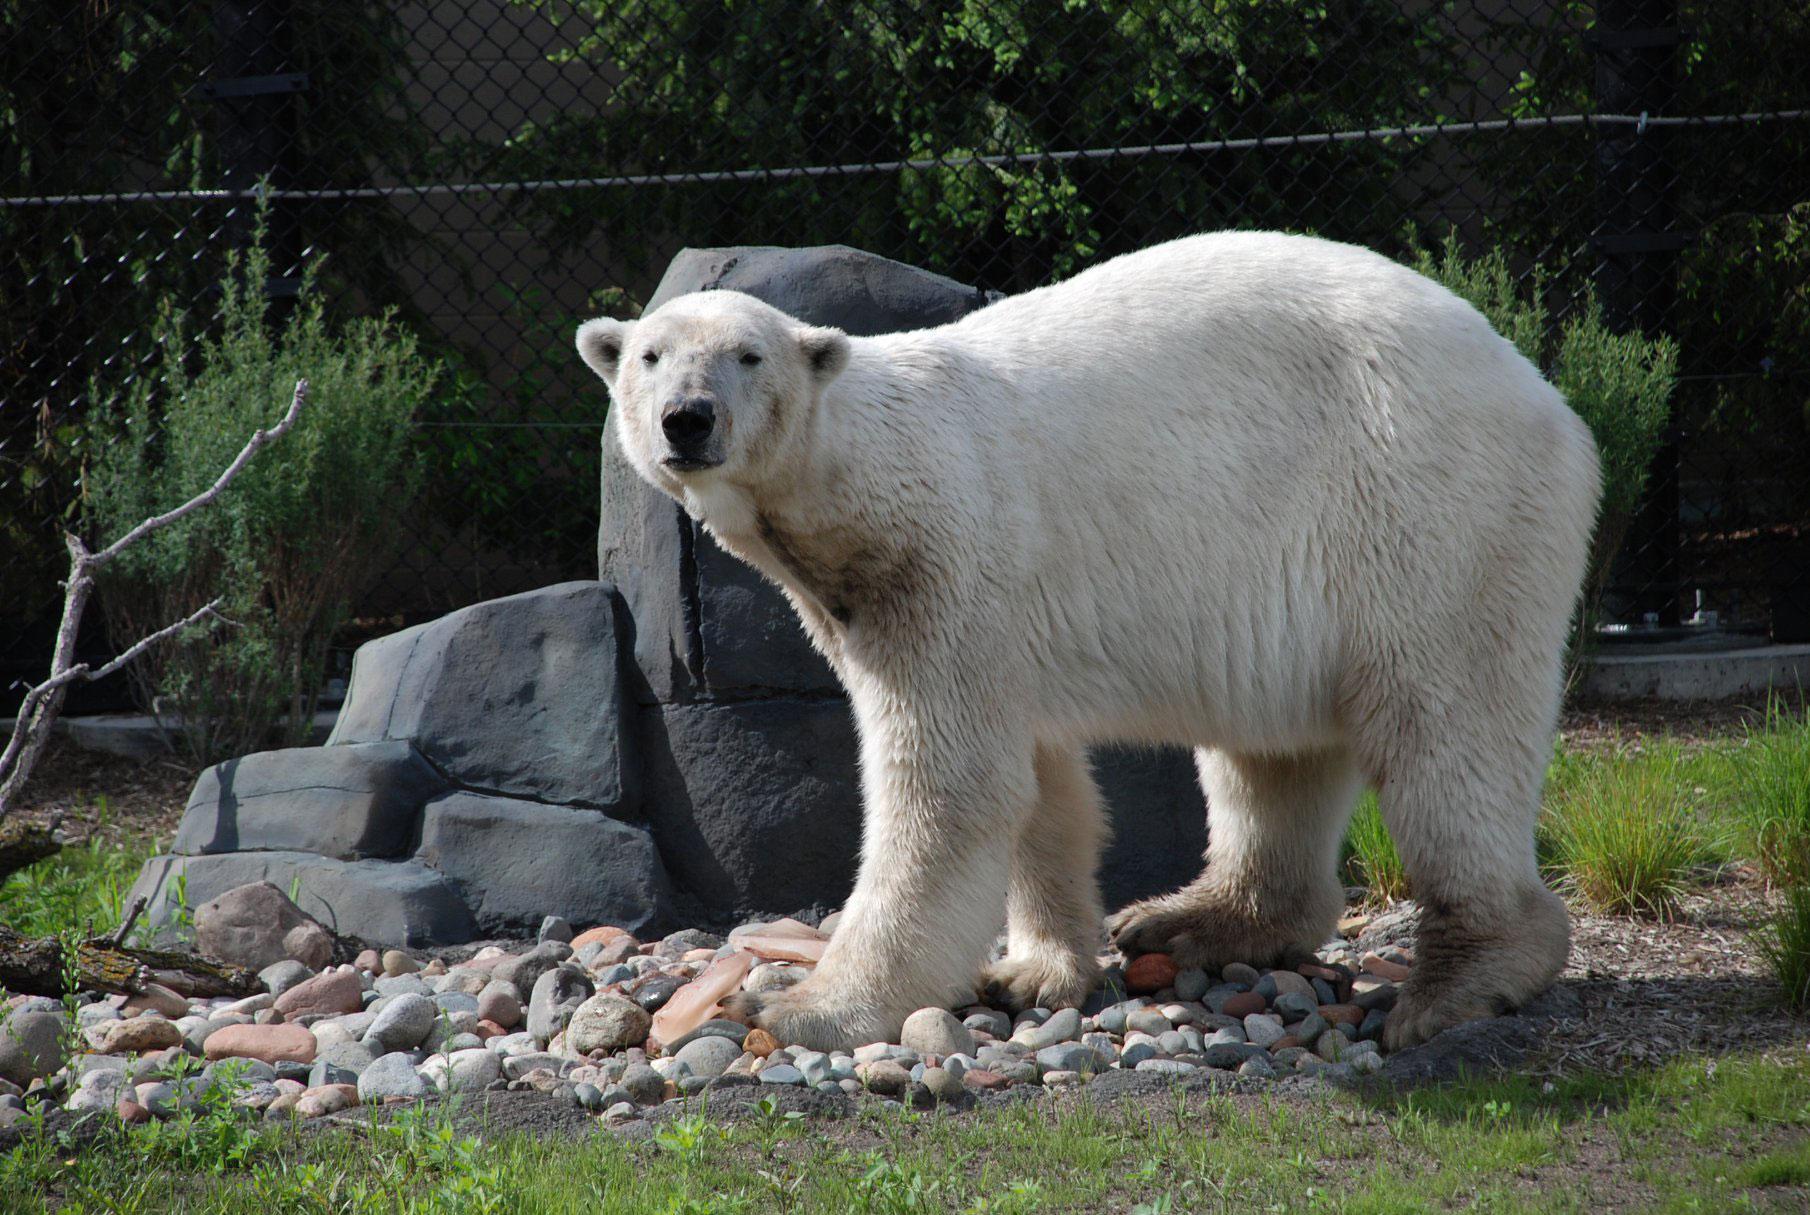 Buzz the polar bear dies at age 24 at Minnesota's Como Park Zoo